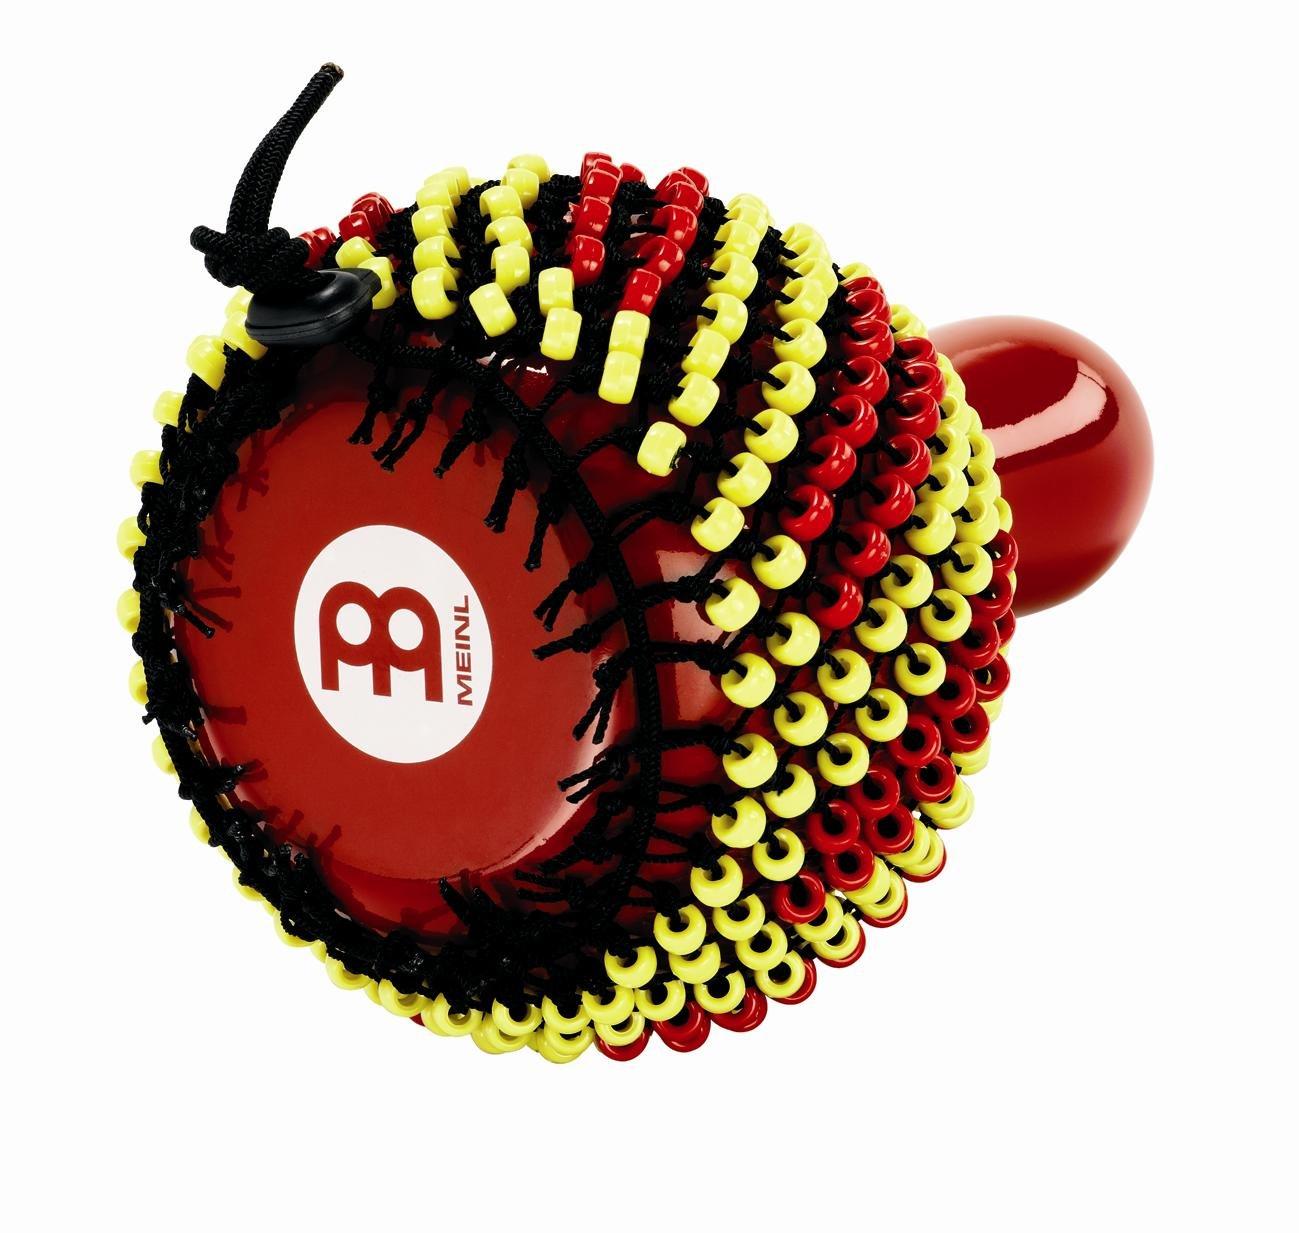 Meinl Percussion CA7R Premium Fiberglass Cabasa, Red by Meinl Percussion